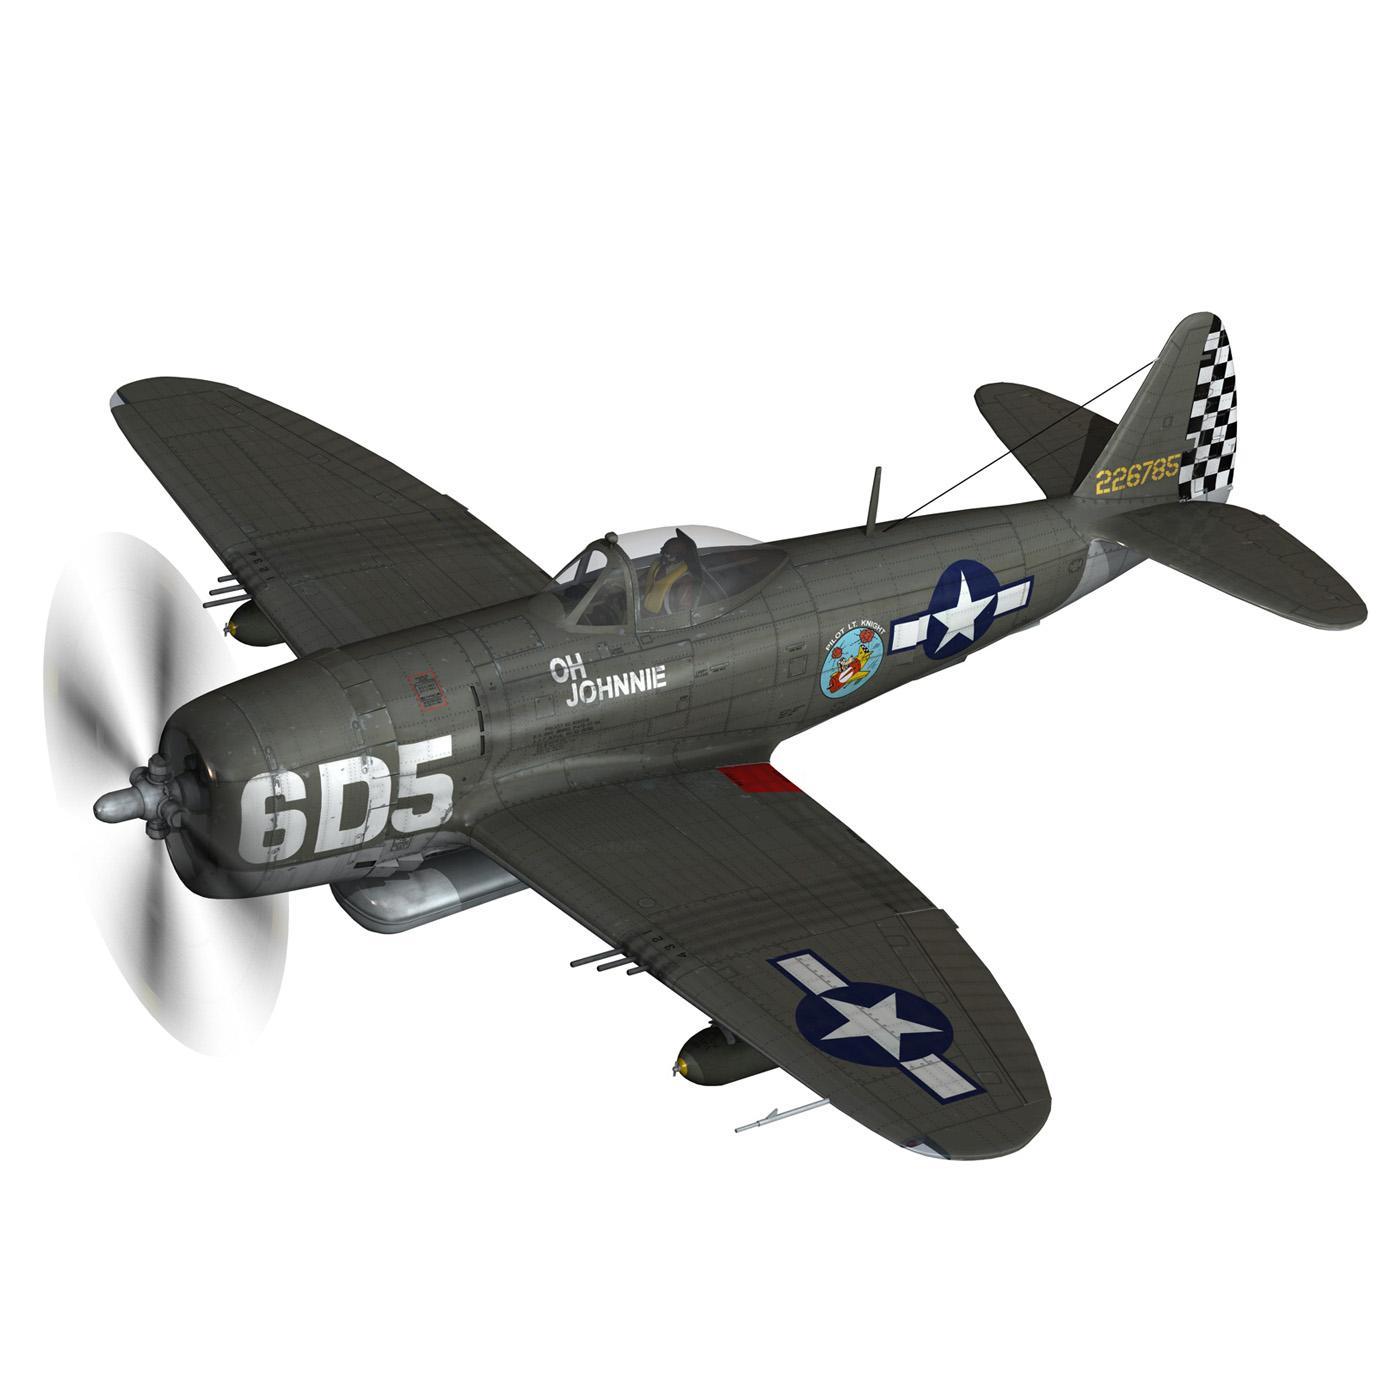 republic p-47 thunderbolt – oh johnnie 3d model fbx c4d lwo obj 274249